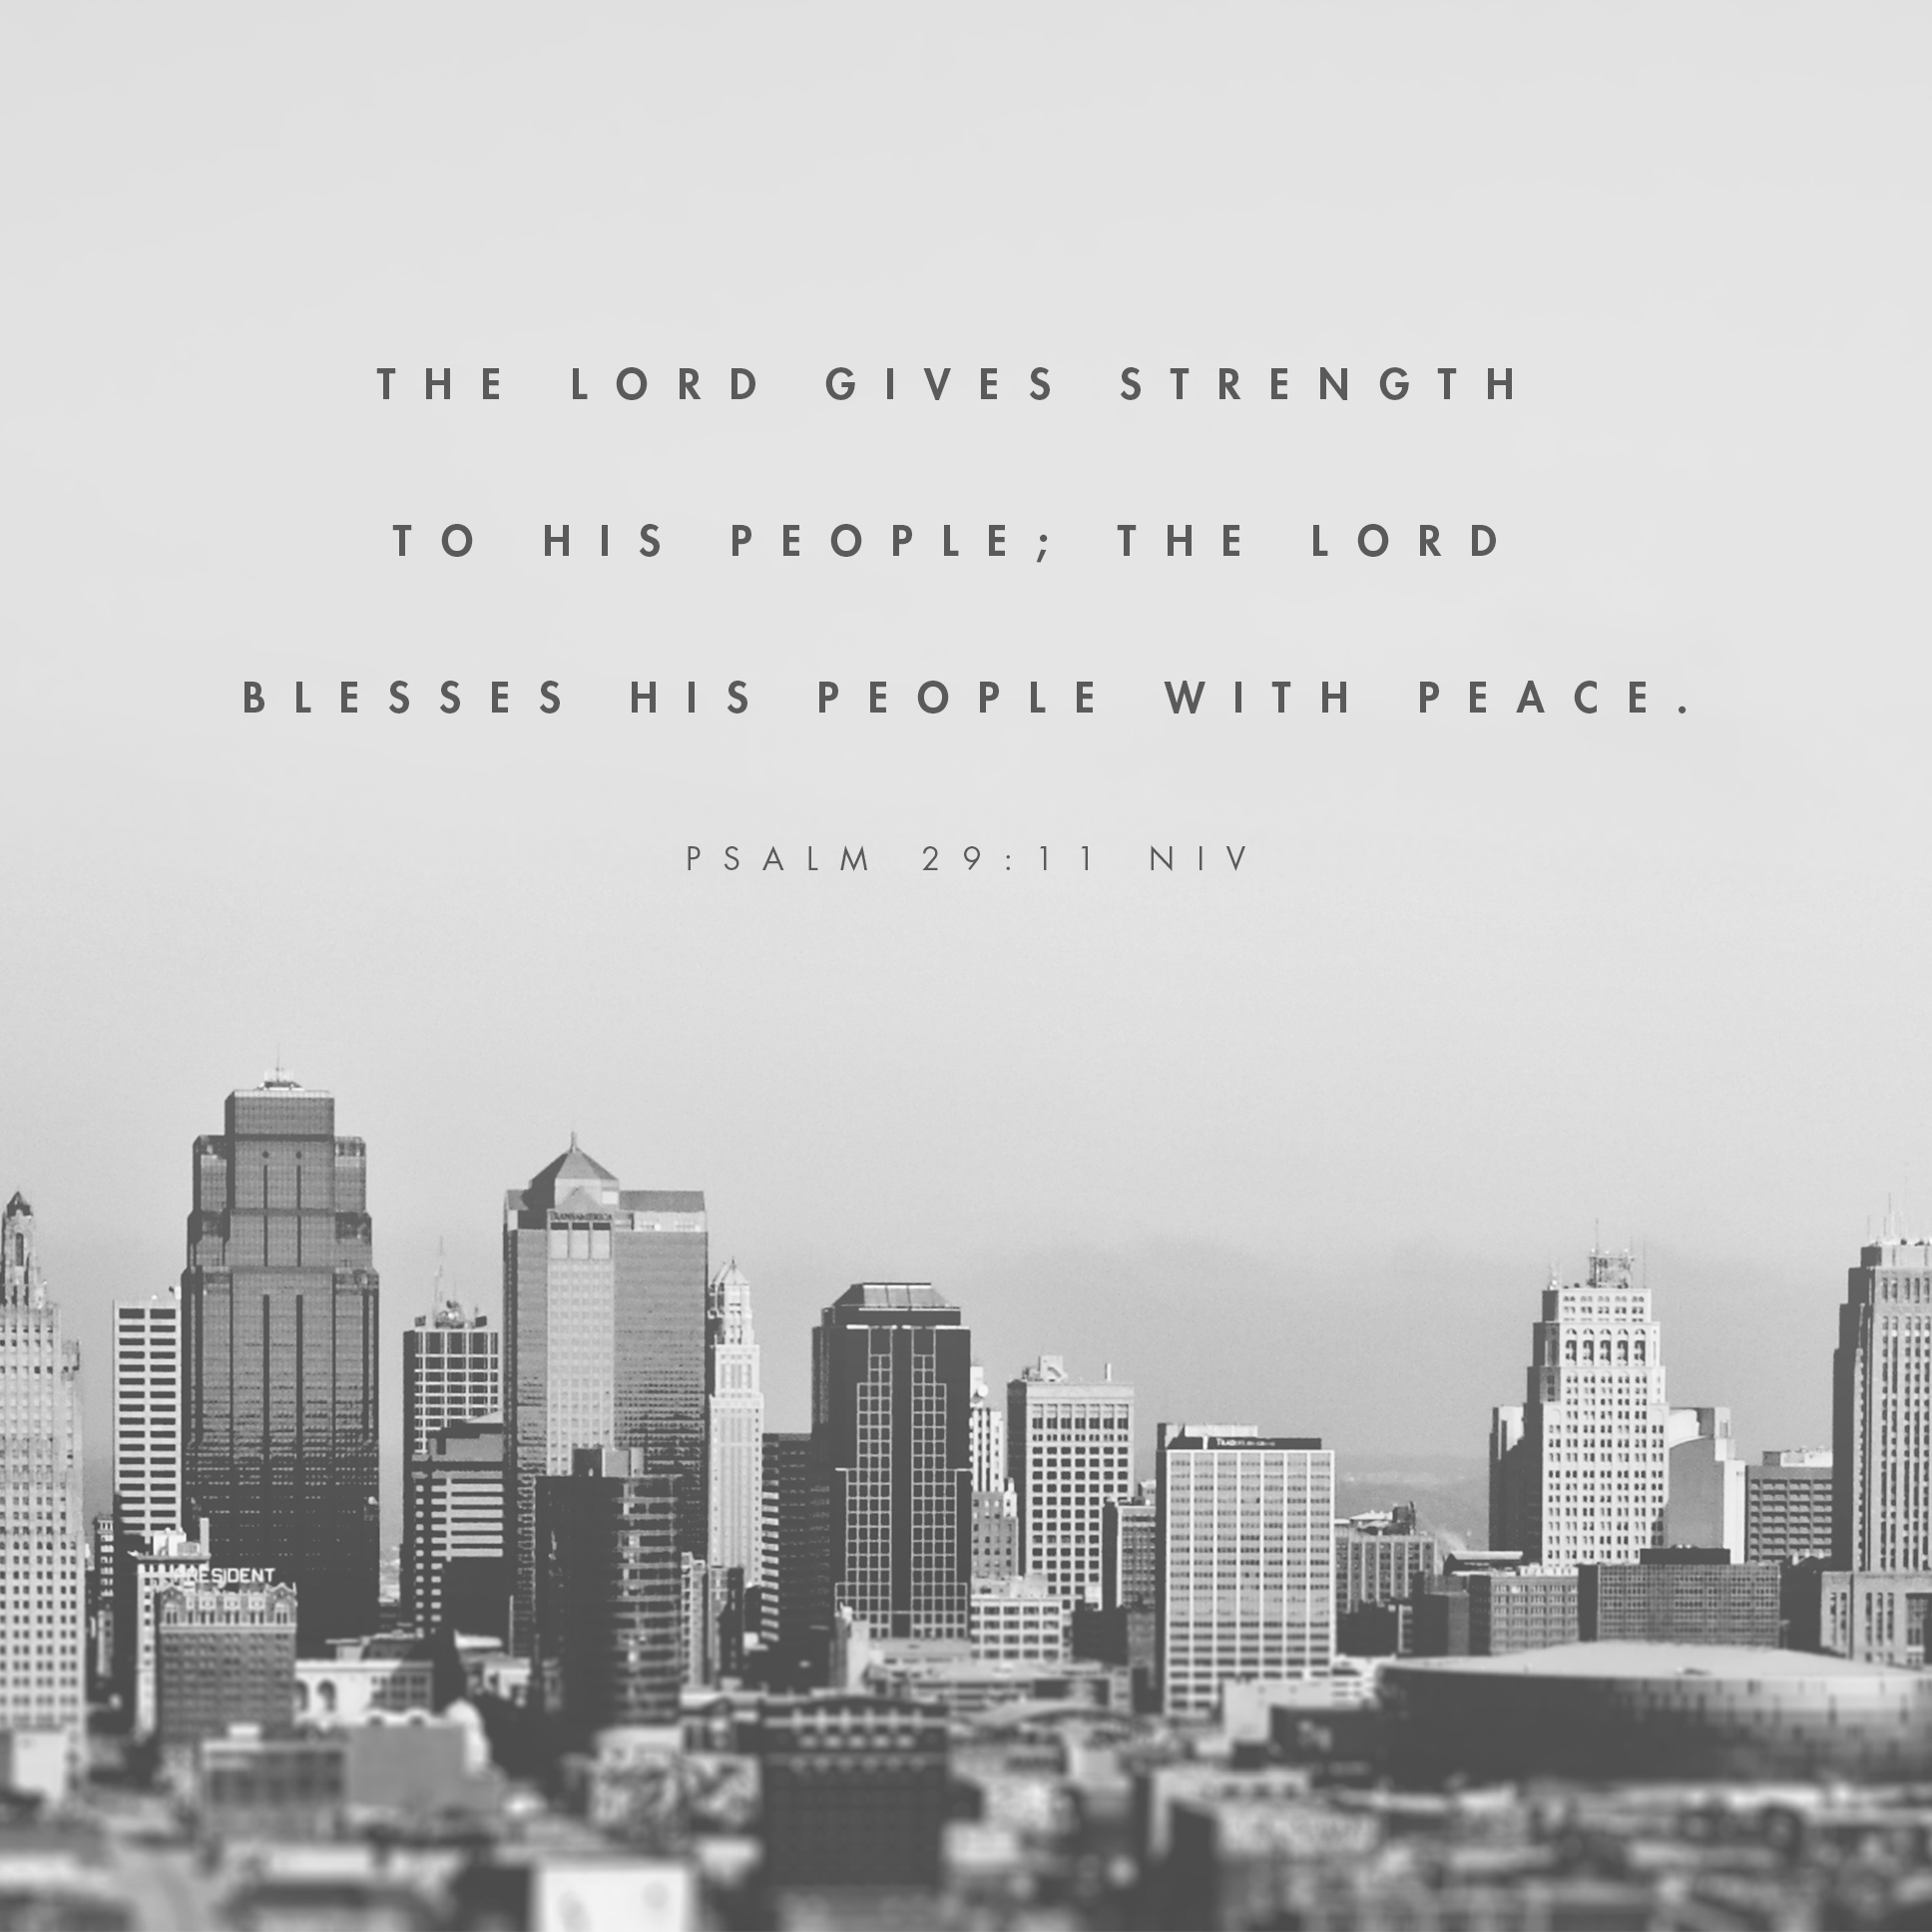 Psalm 29:11 NIV (JPG) | Psalm 29:11 NIV | Free Church